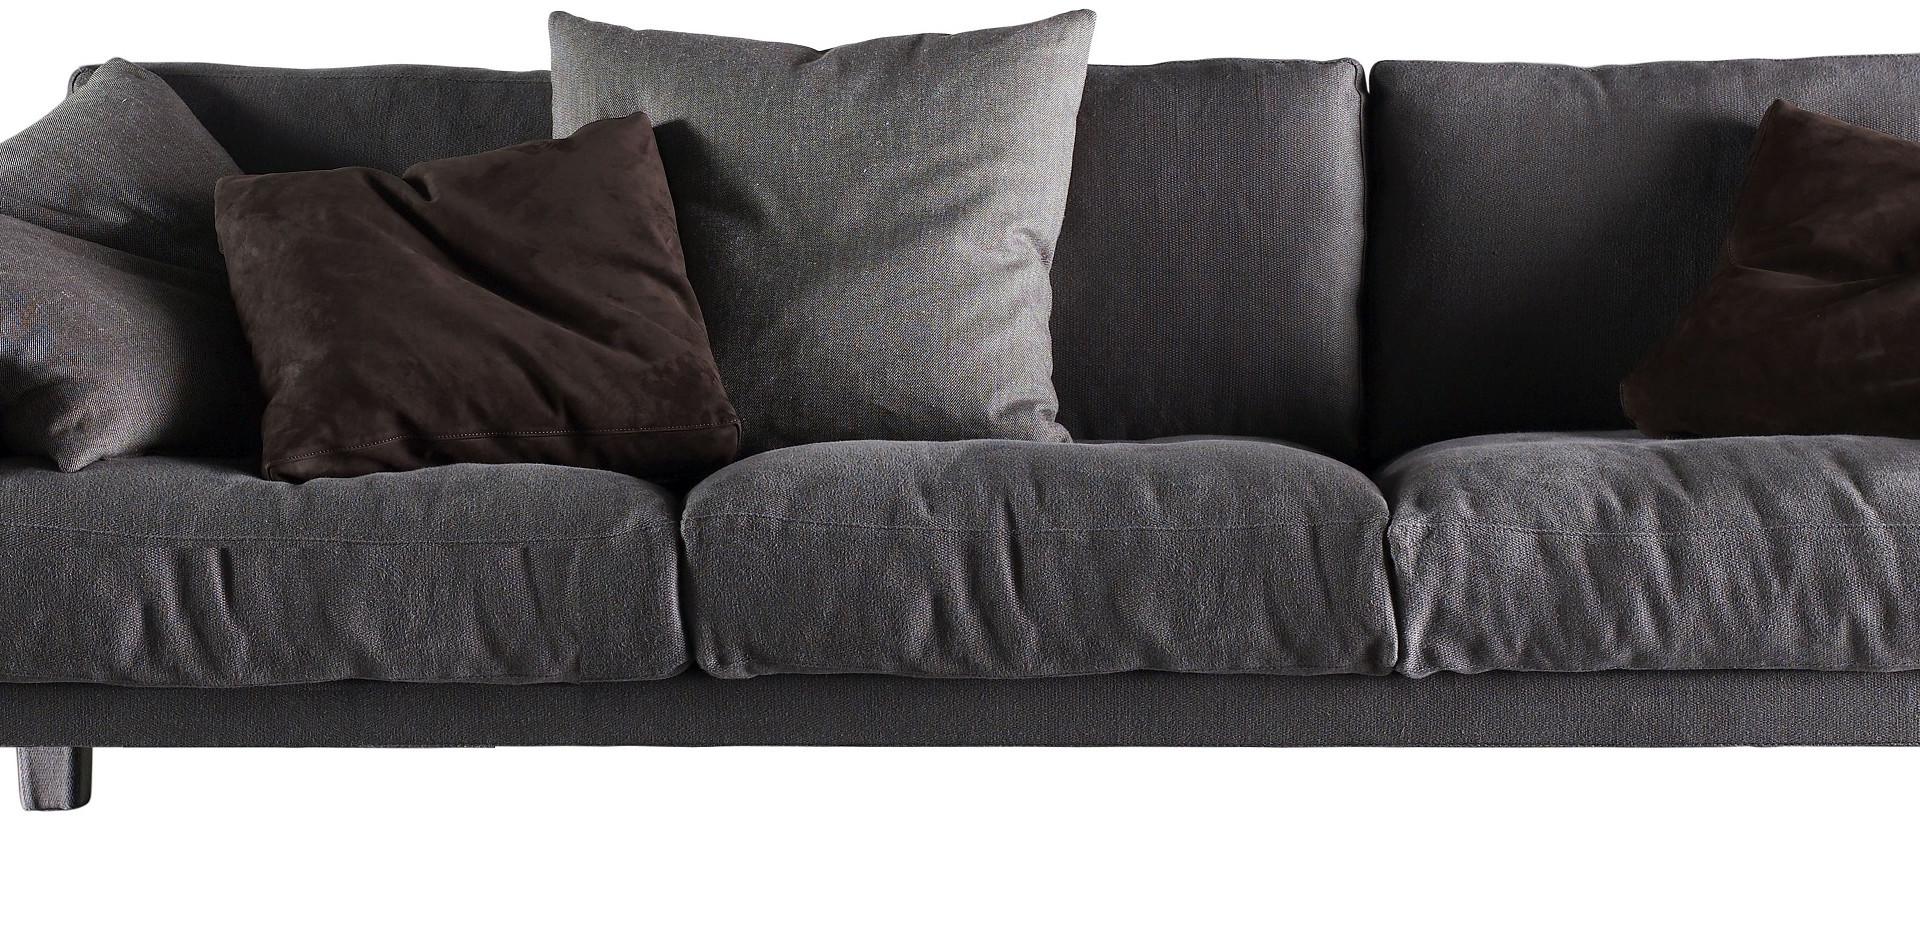 meridiani soft sofa.jpg